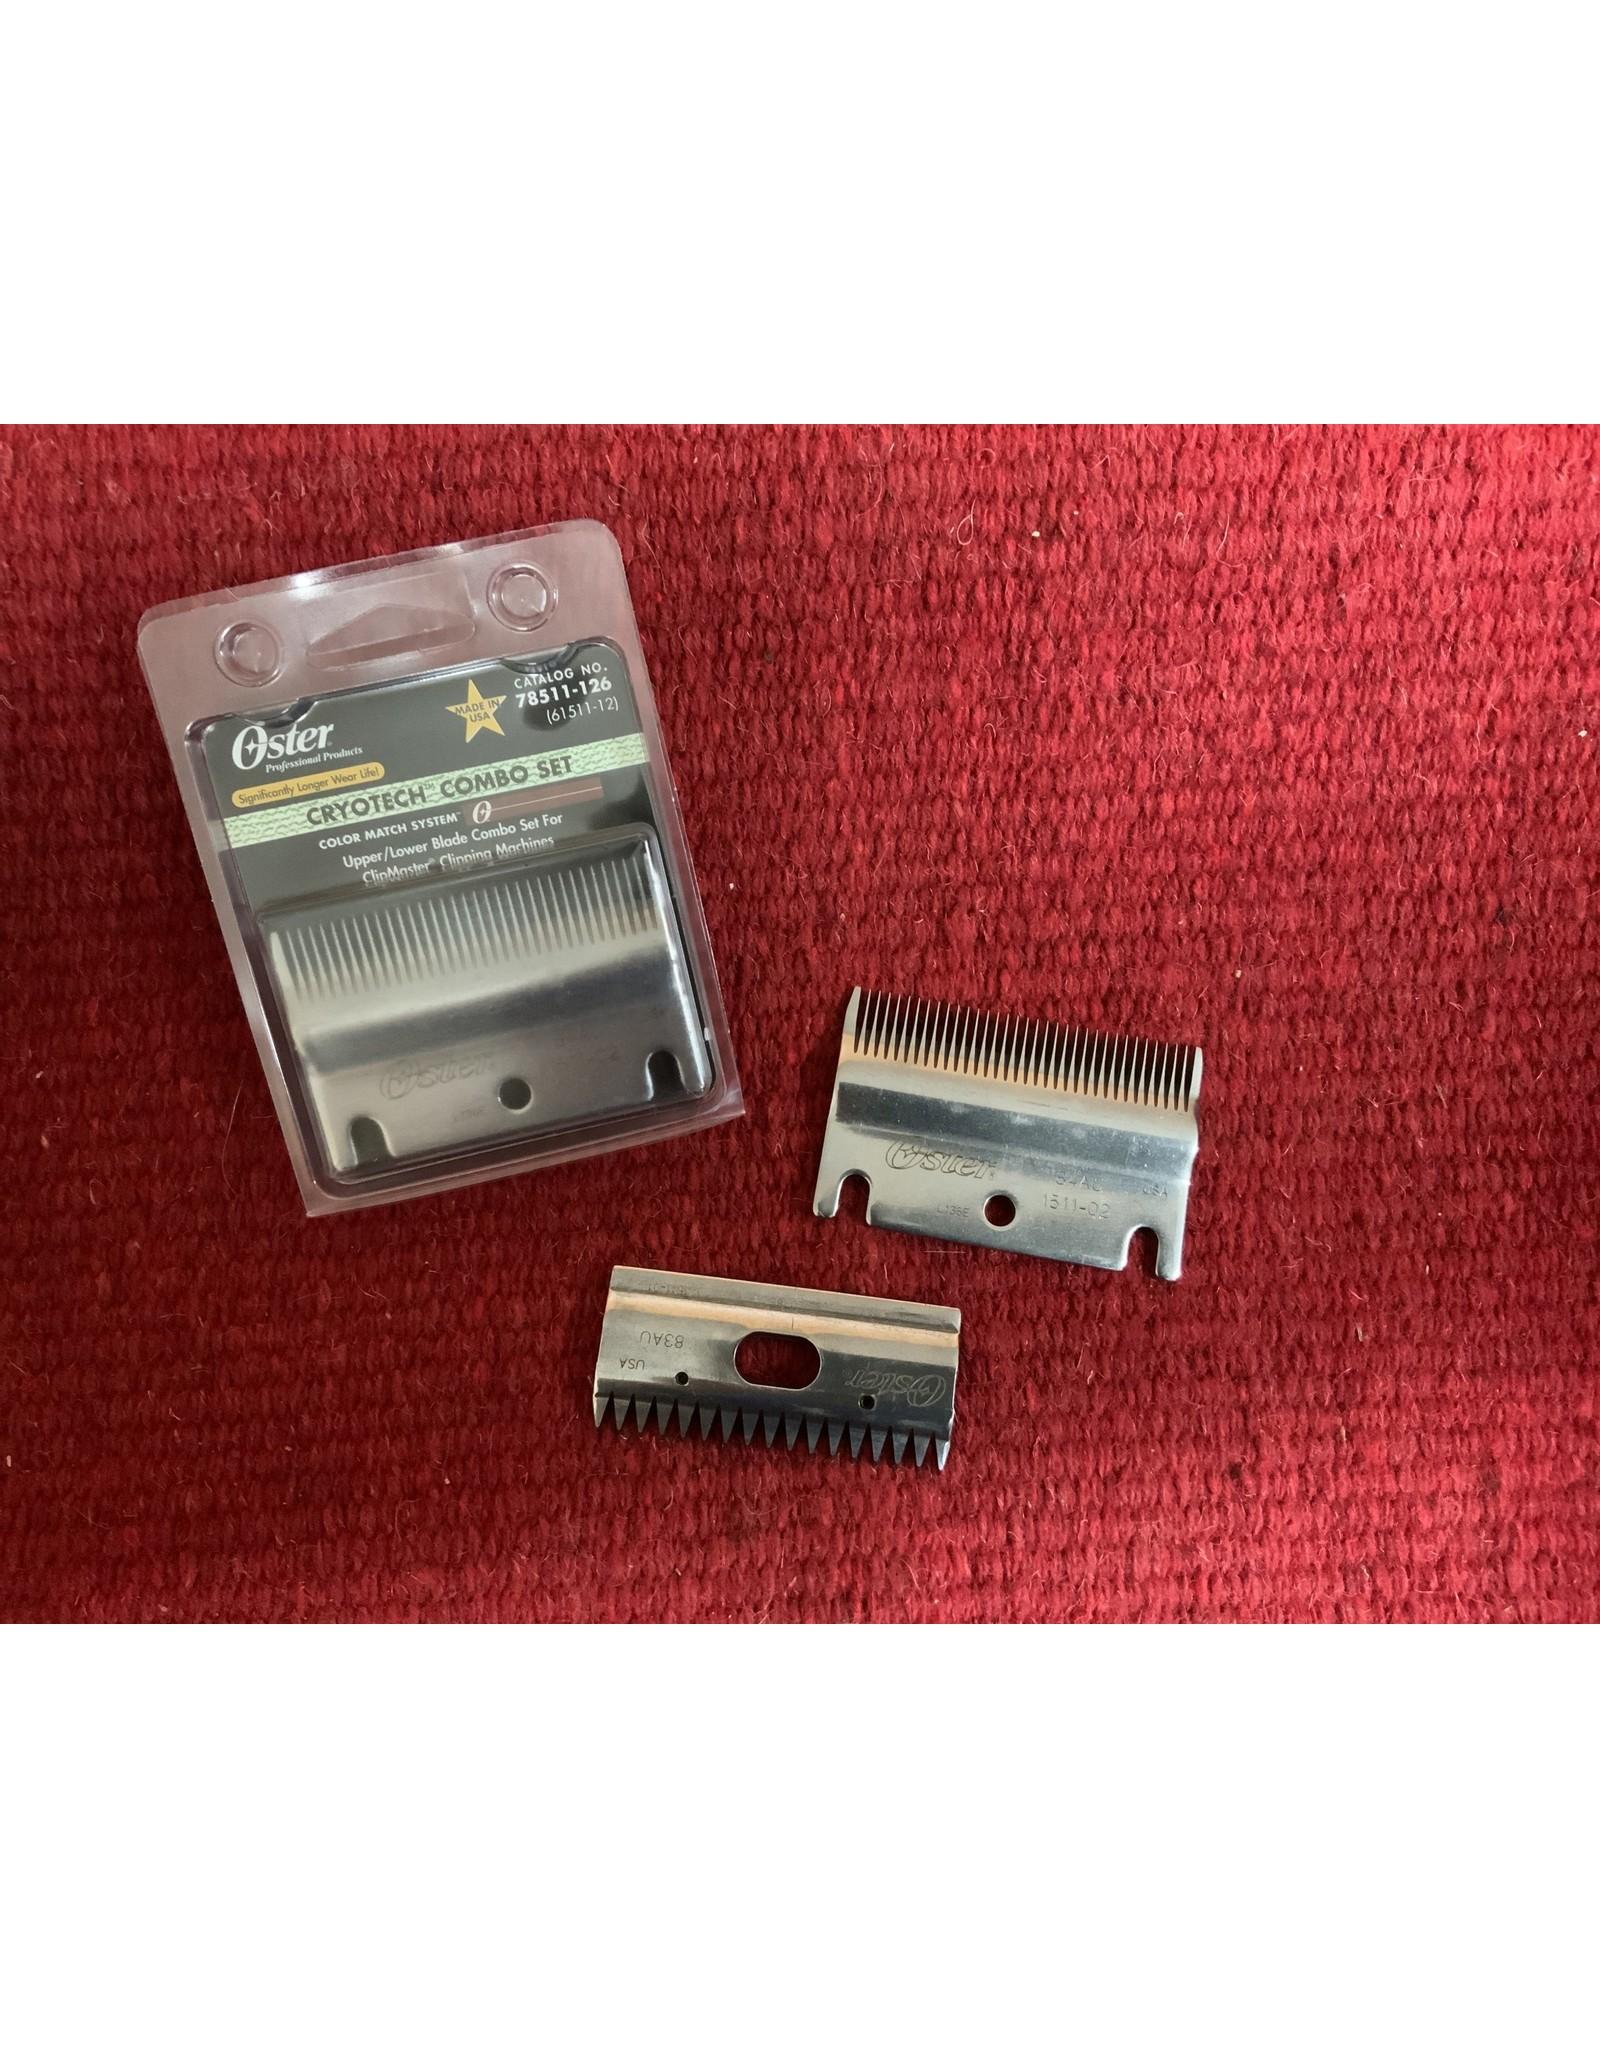 Blade 83/84 Clipmaster  043-053